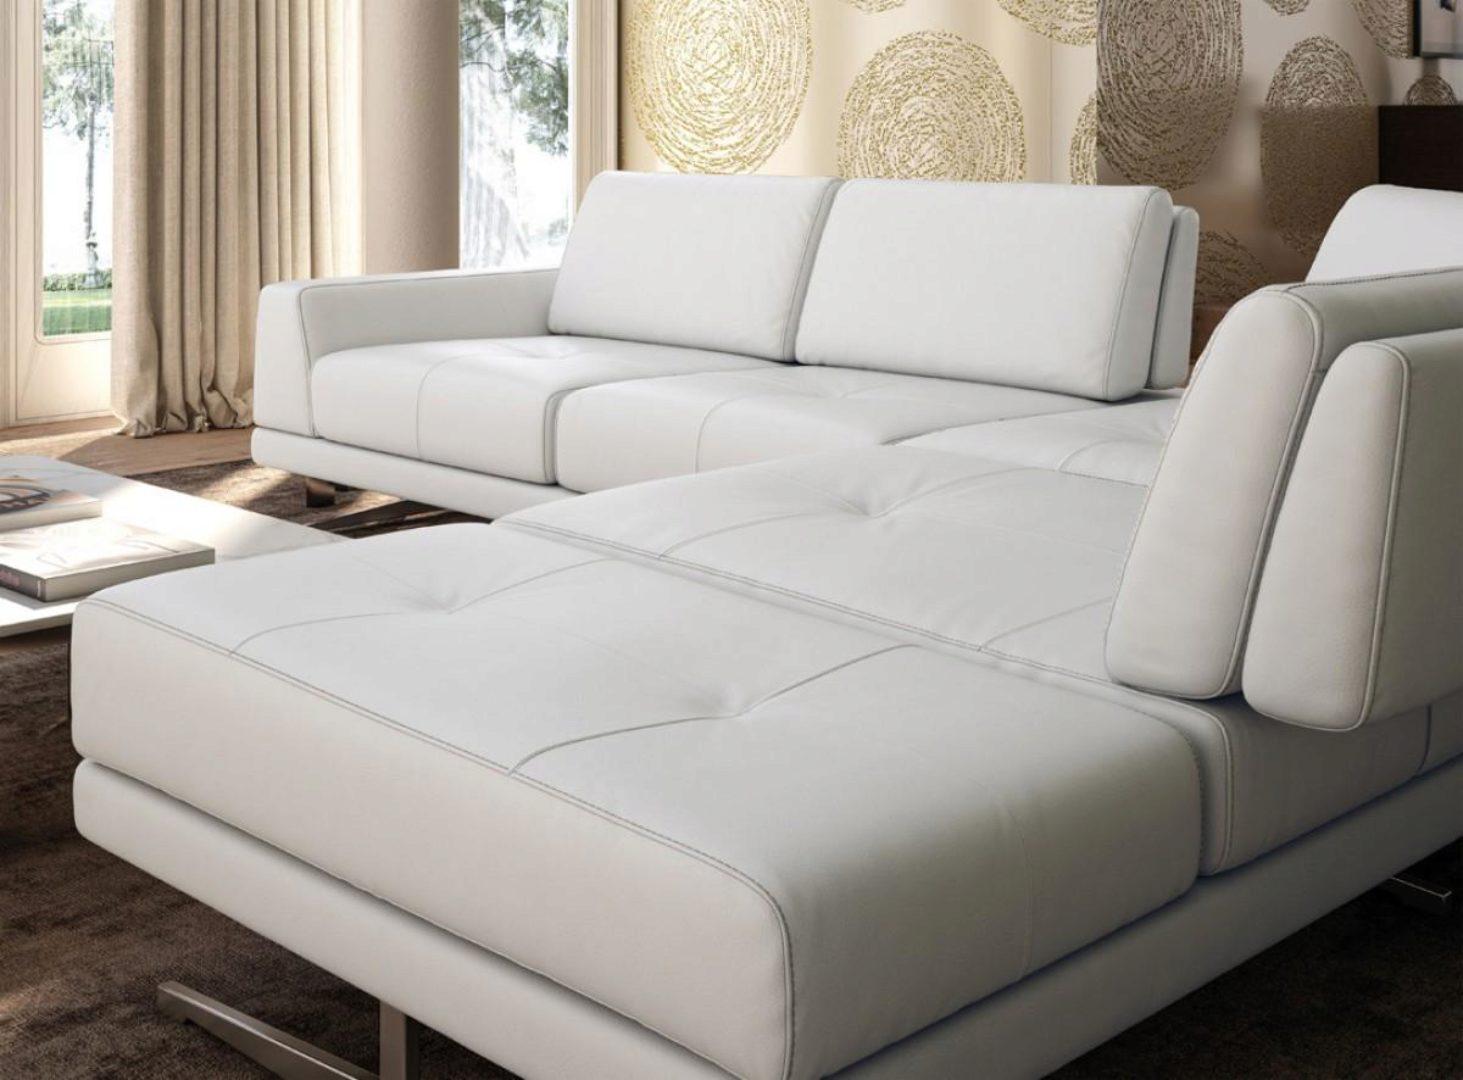 accenti italia bellagio modern white leather sectional sofa made in italy